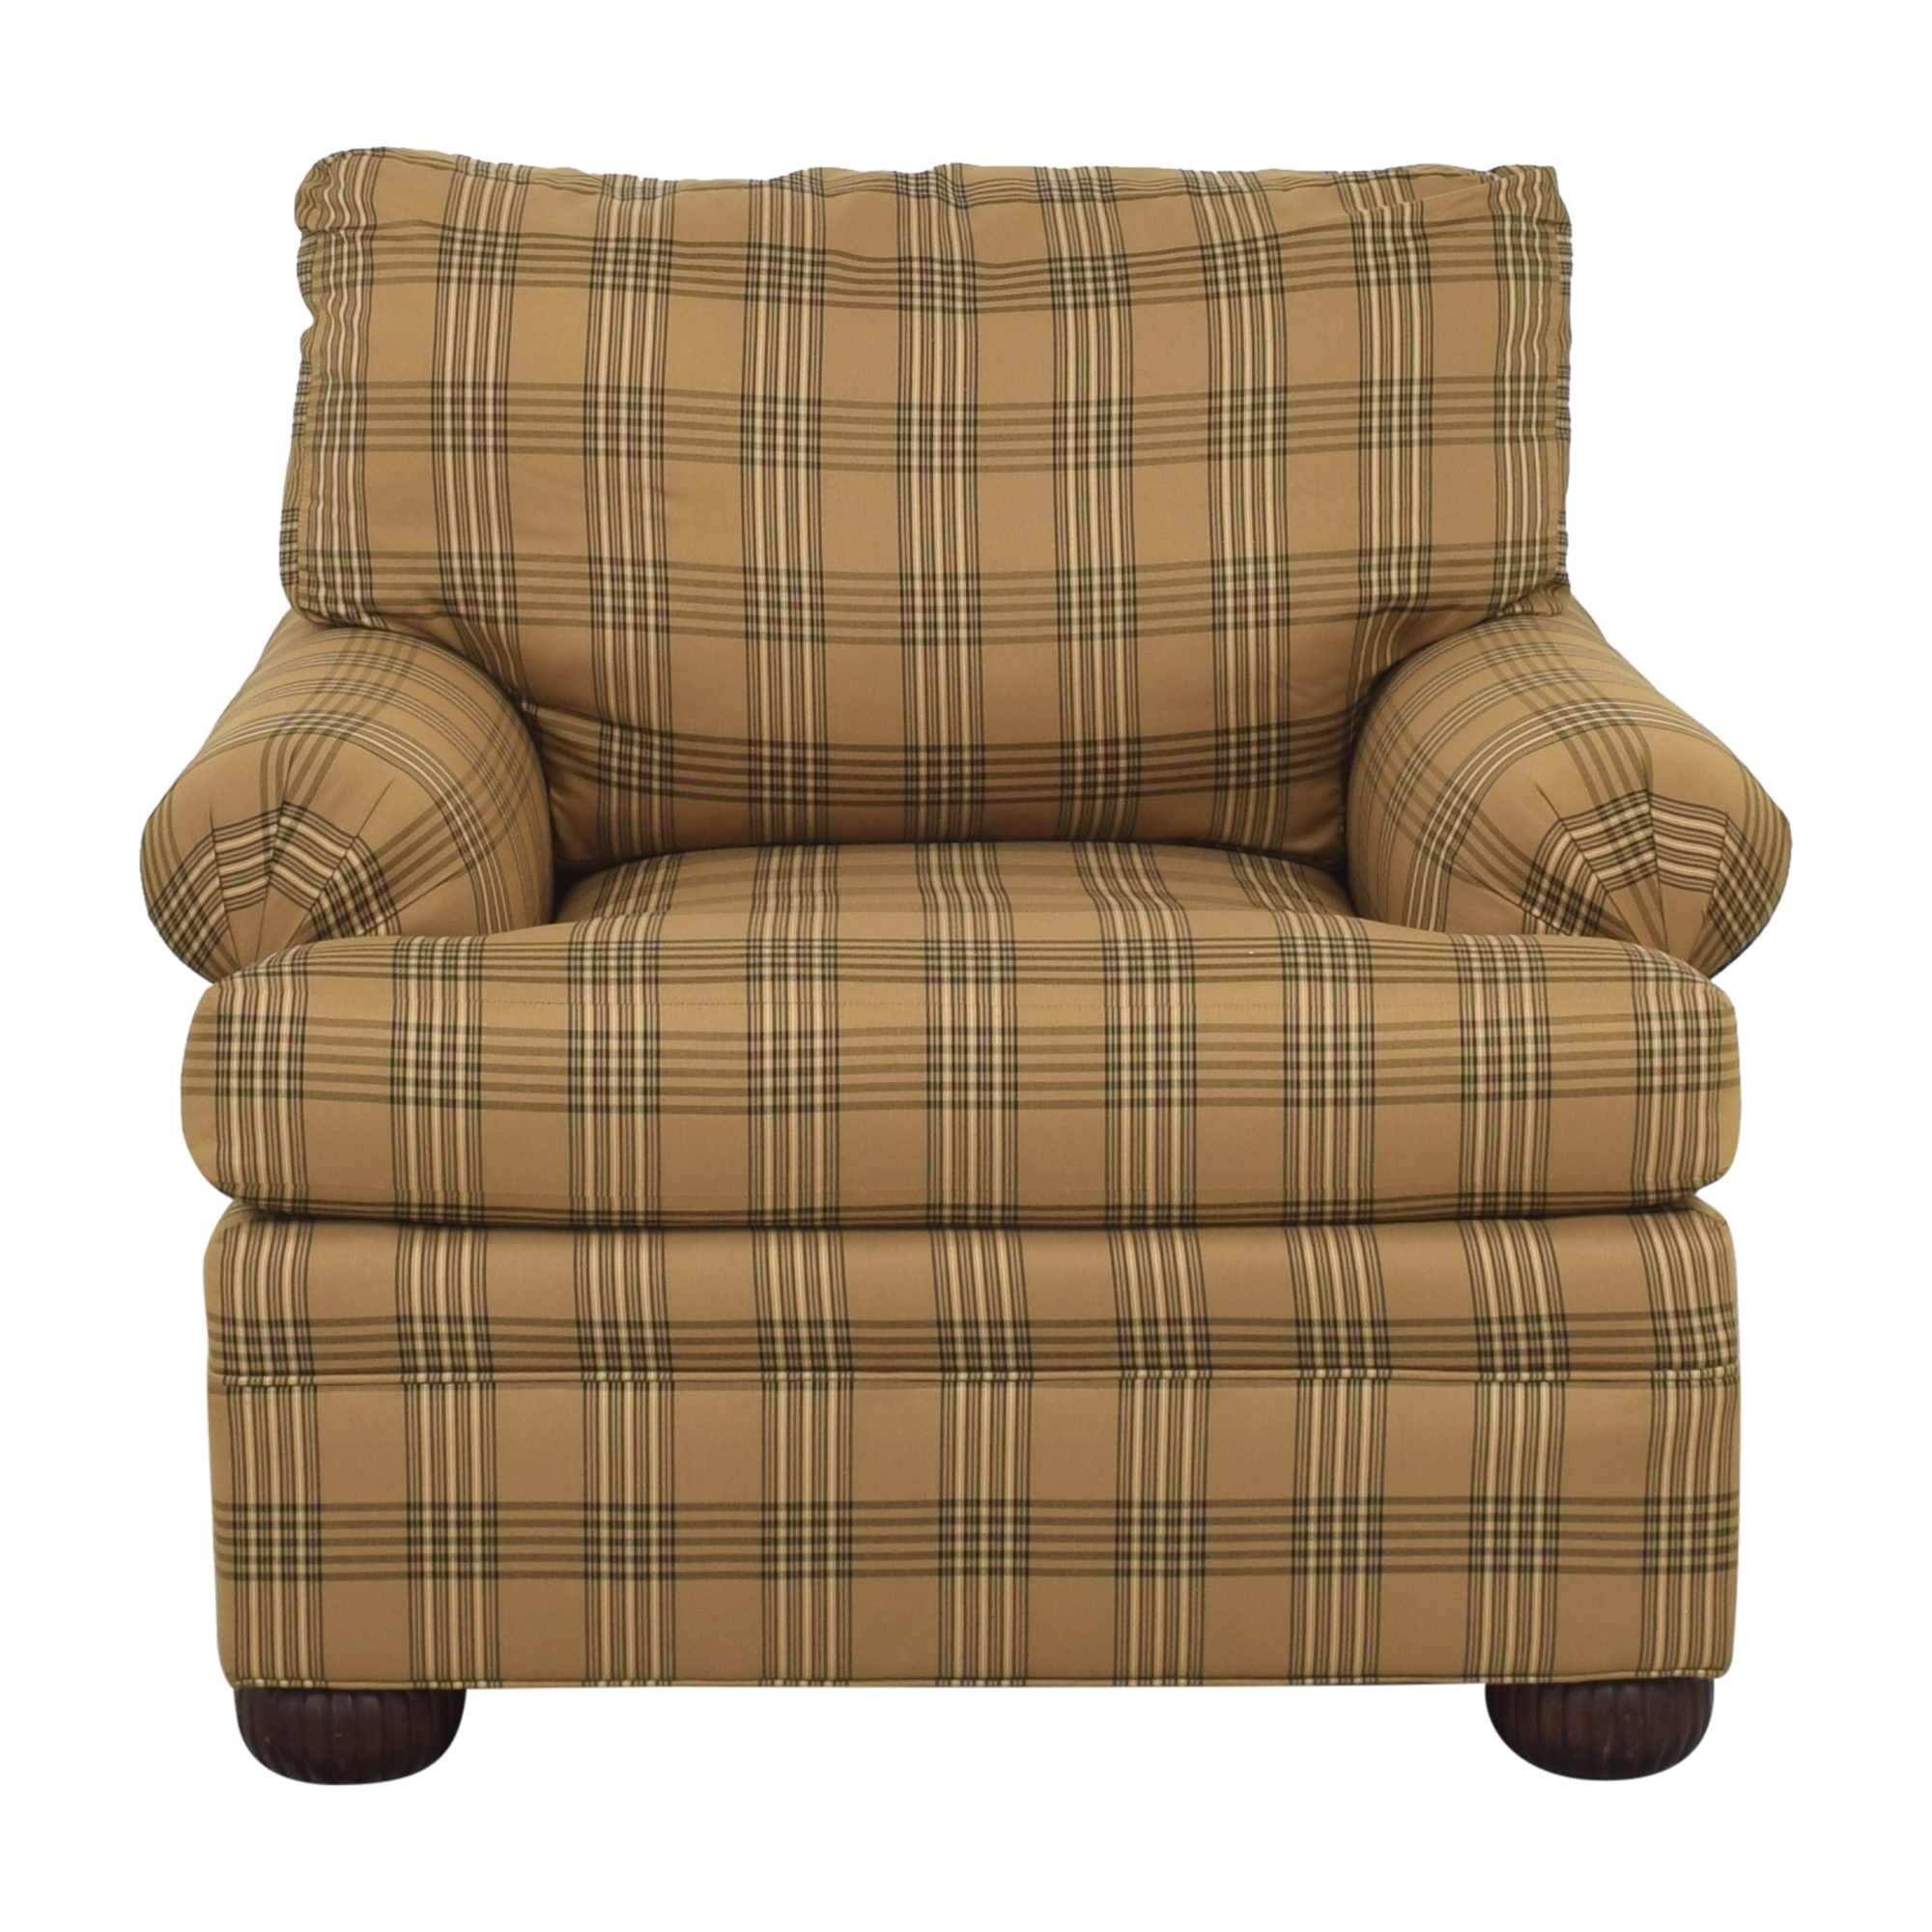 Ethan Allen Ethan Allen Club Chair and Ottoman nj